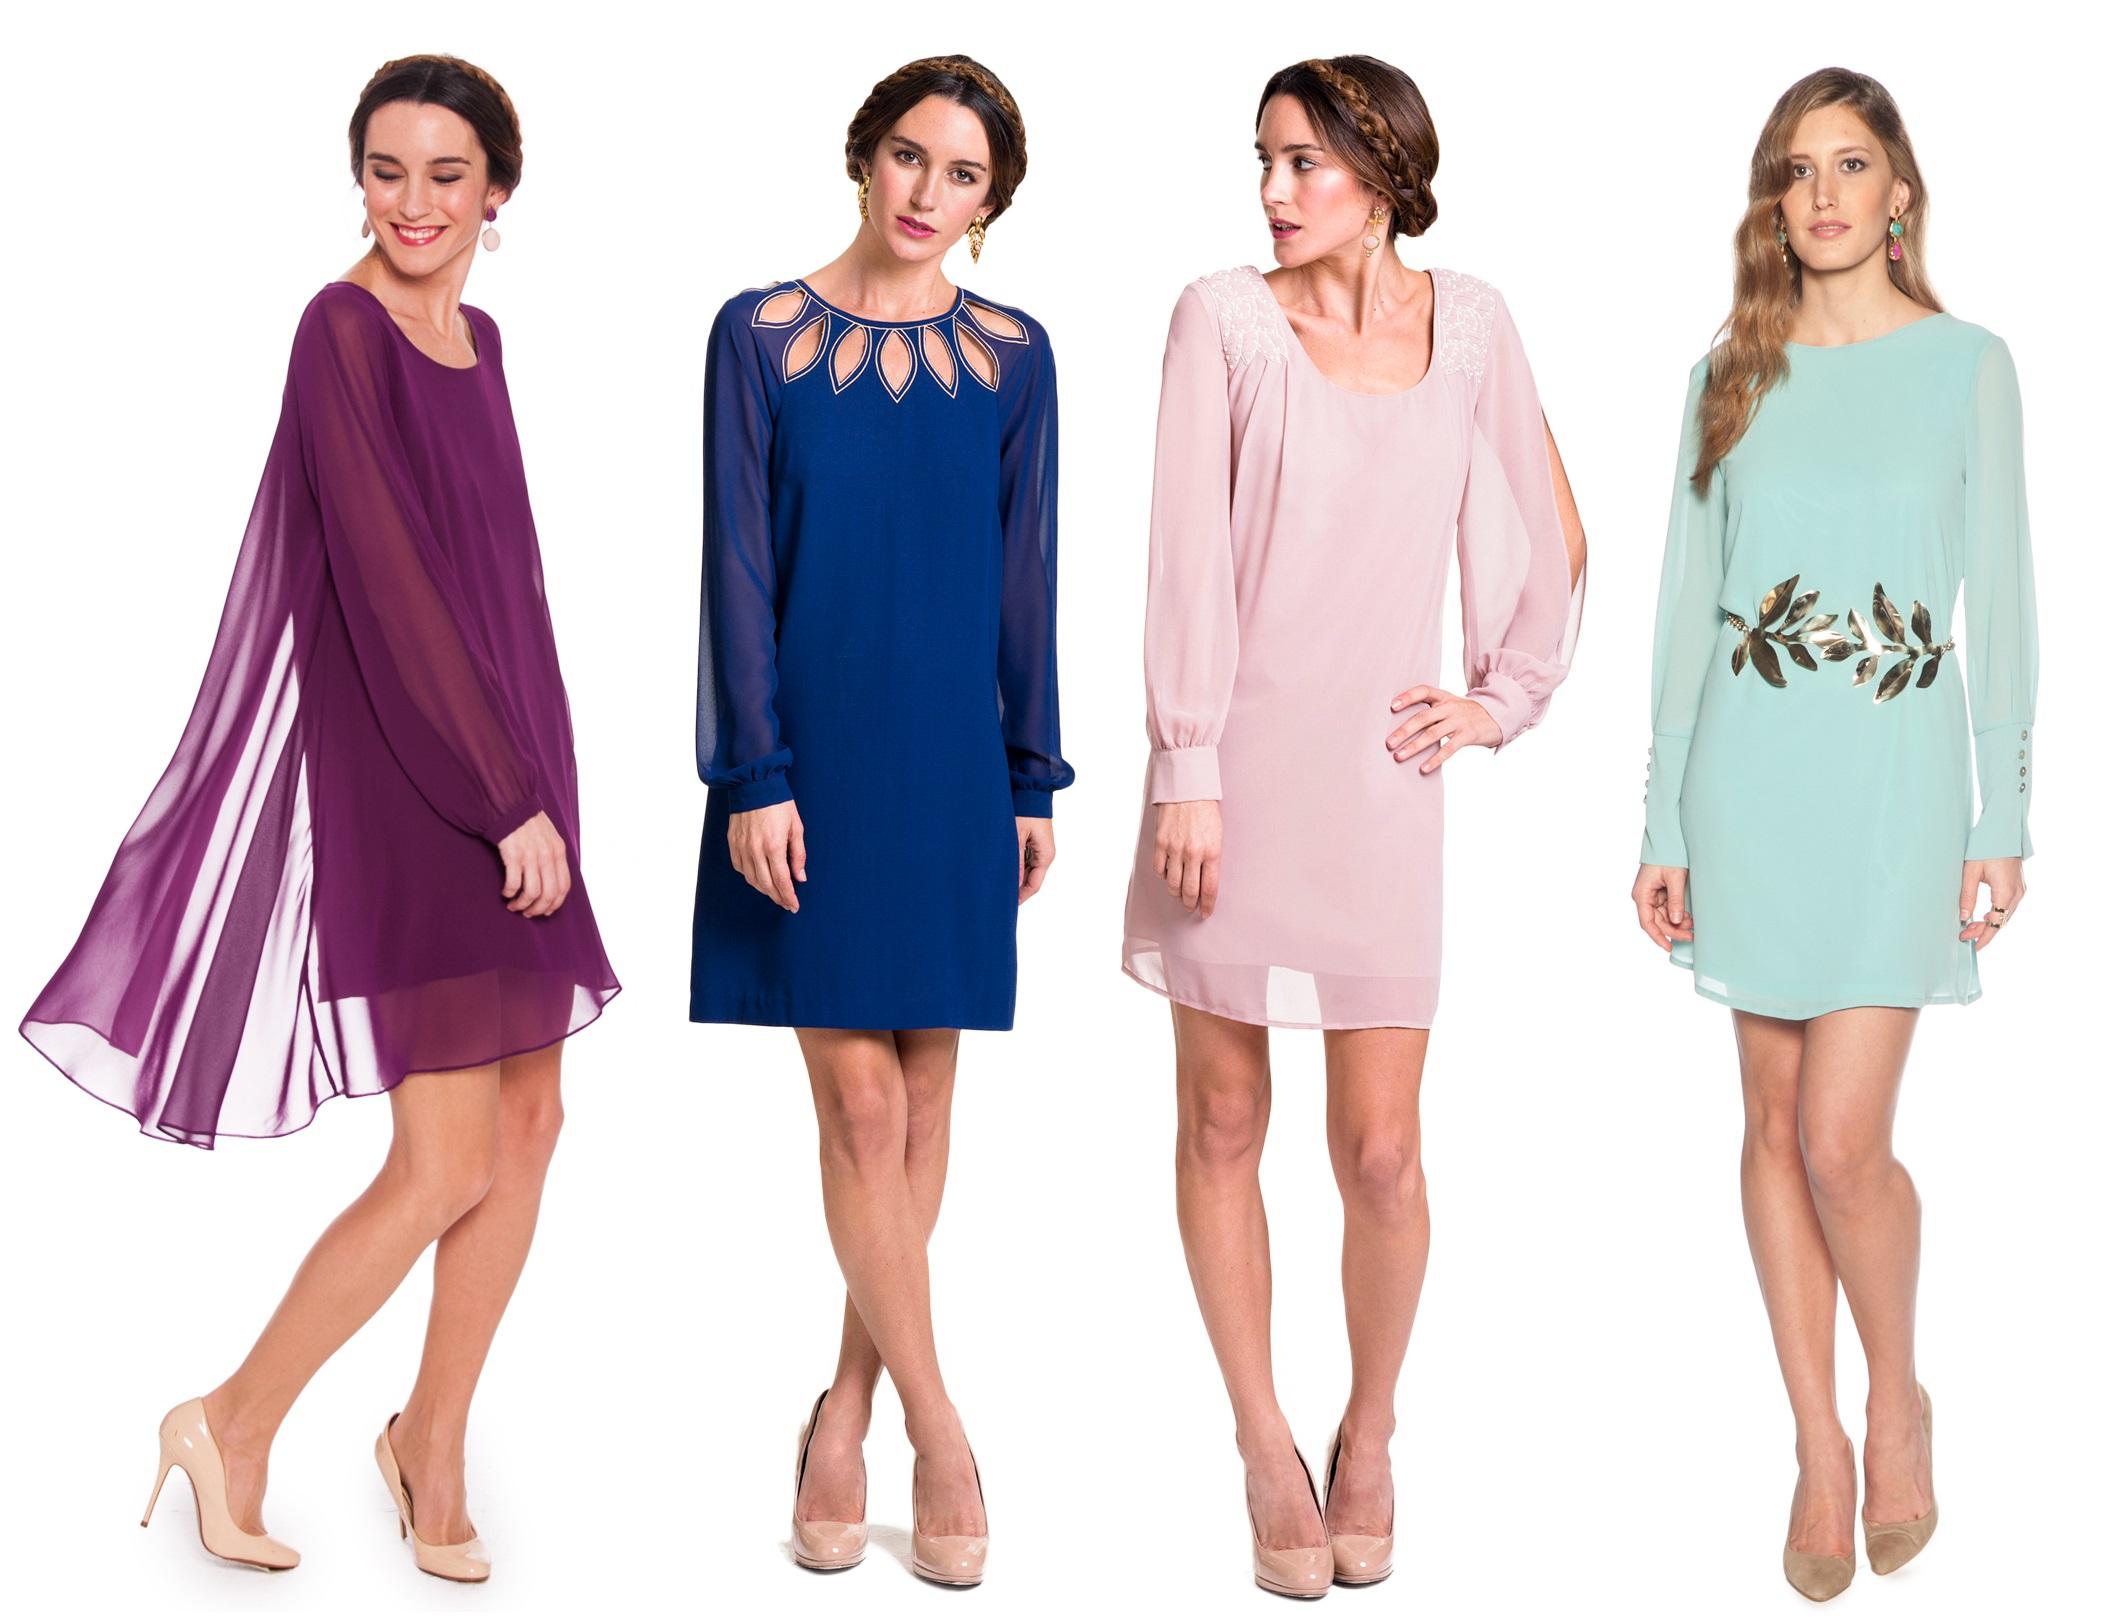 vestido recto de manga larga de lamasmona.com